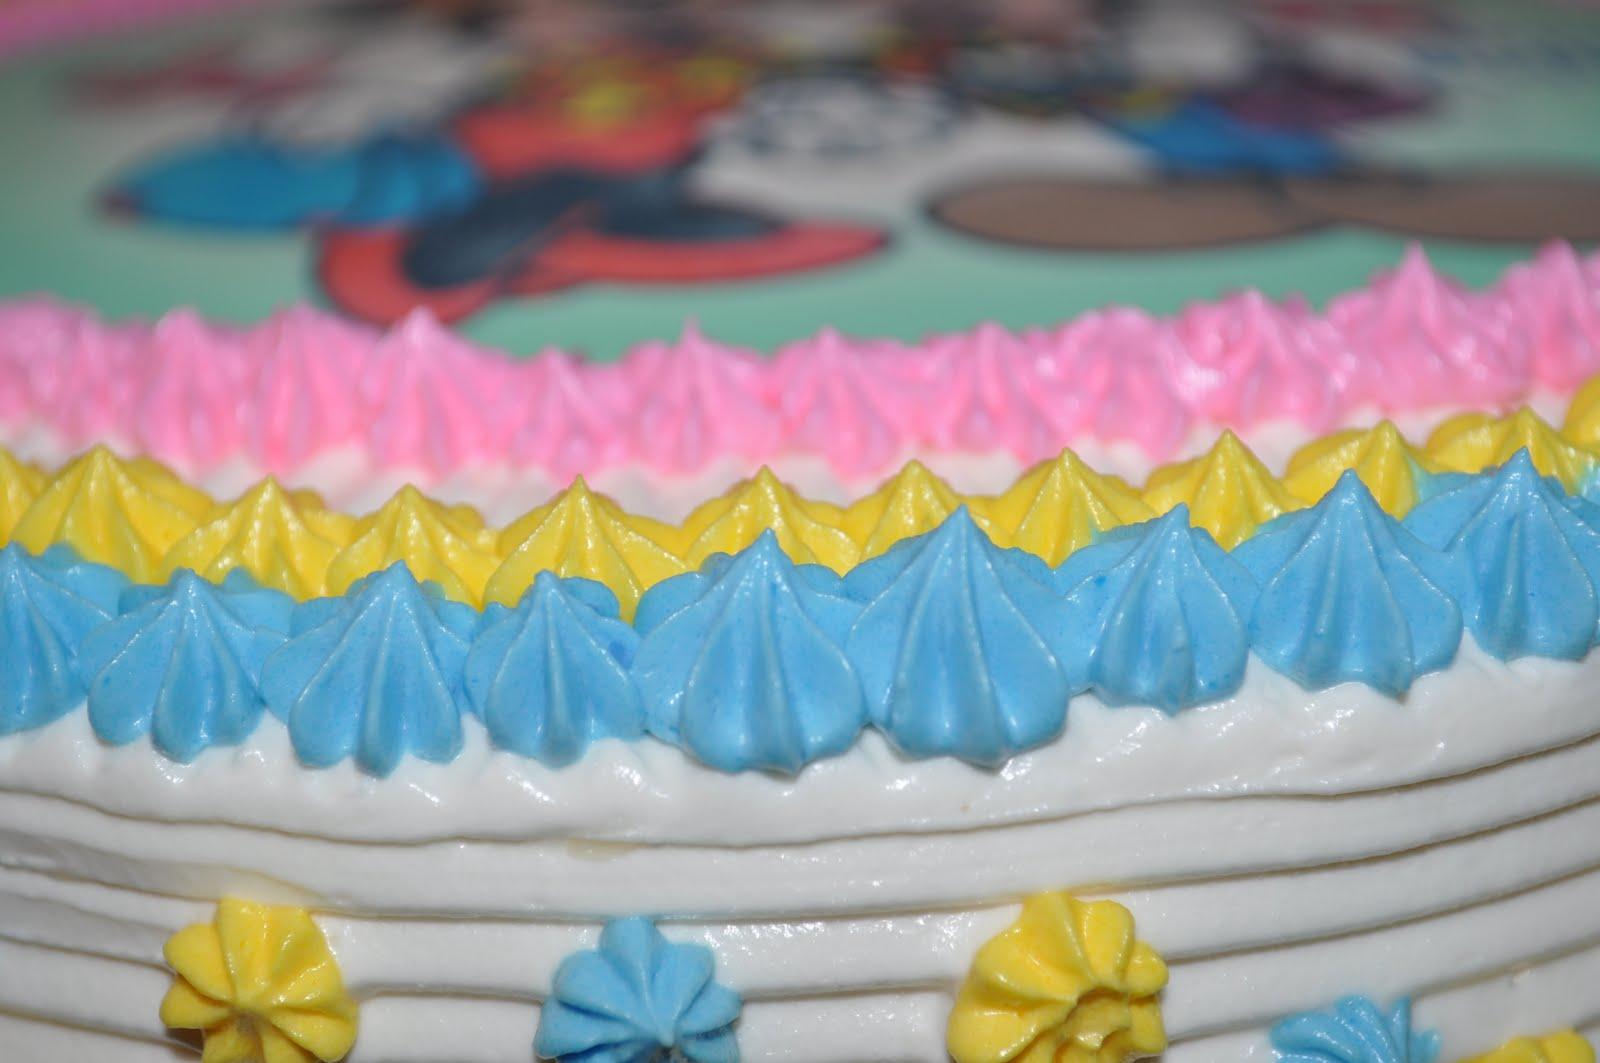 Edible Cake Images Dunedin : Cake House: TEMPAHAN EDIBLE IMAGE